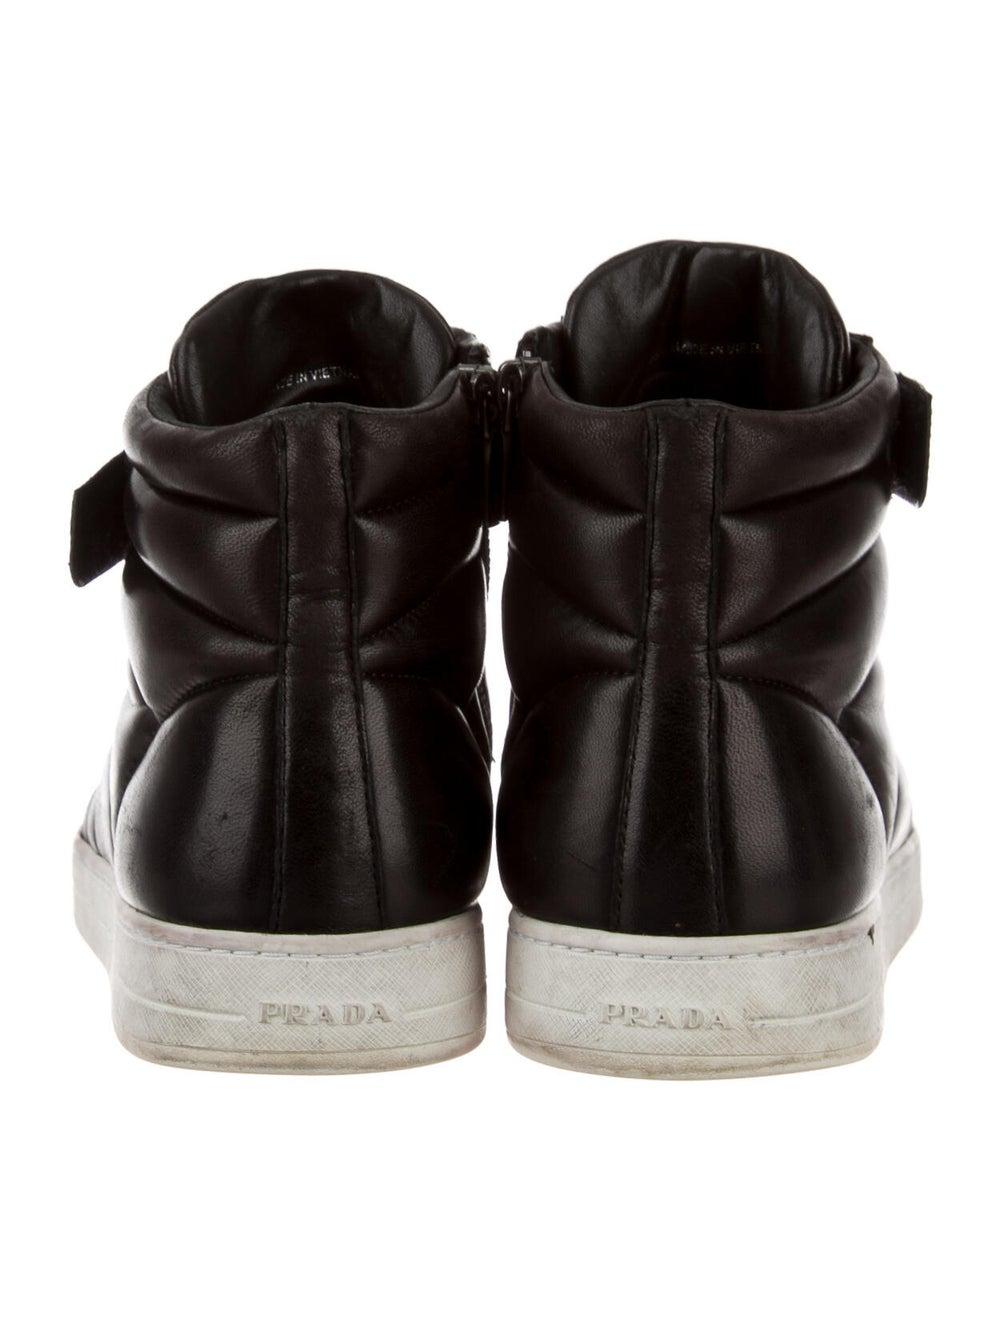 Prada Sport Leather Sneakers Black - image 4